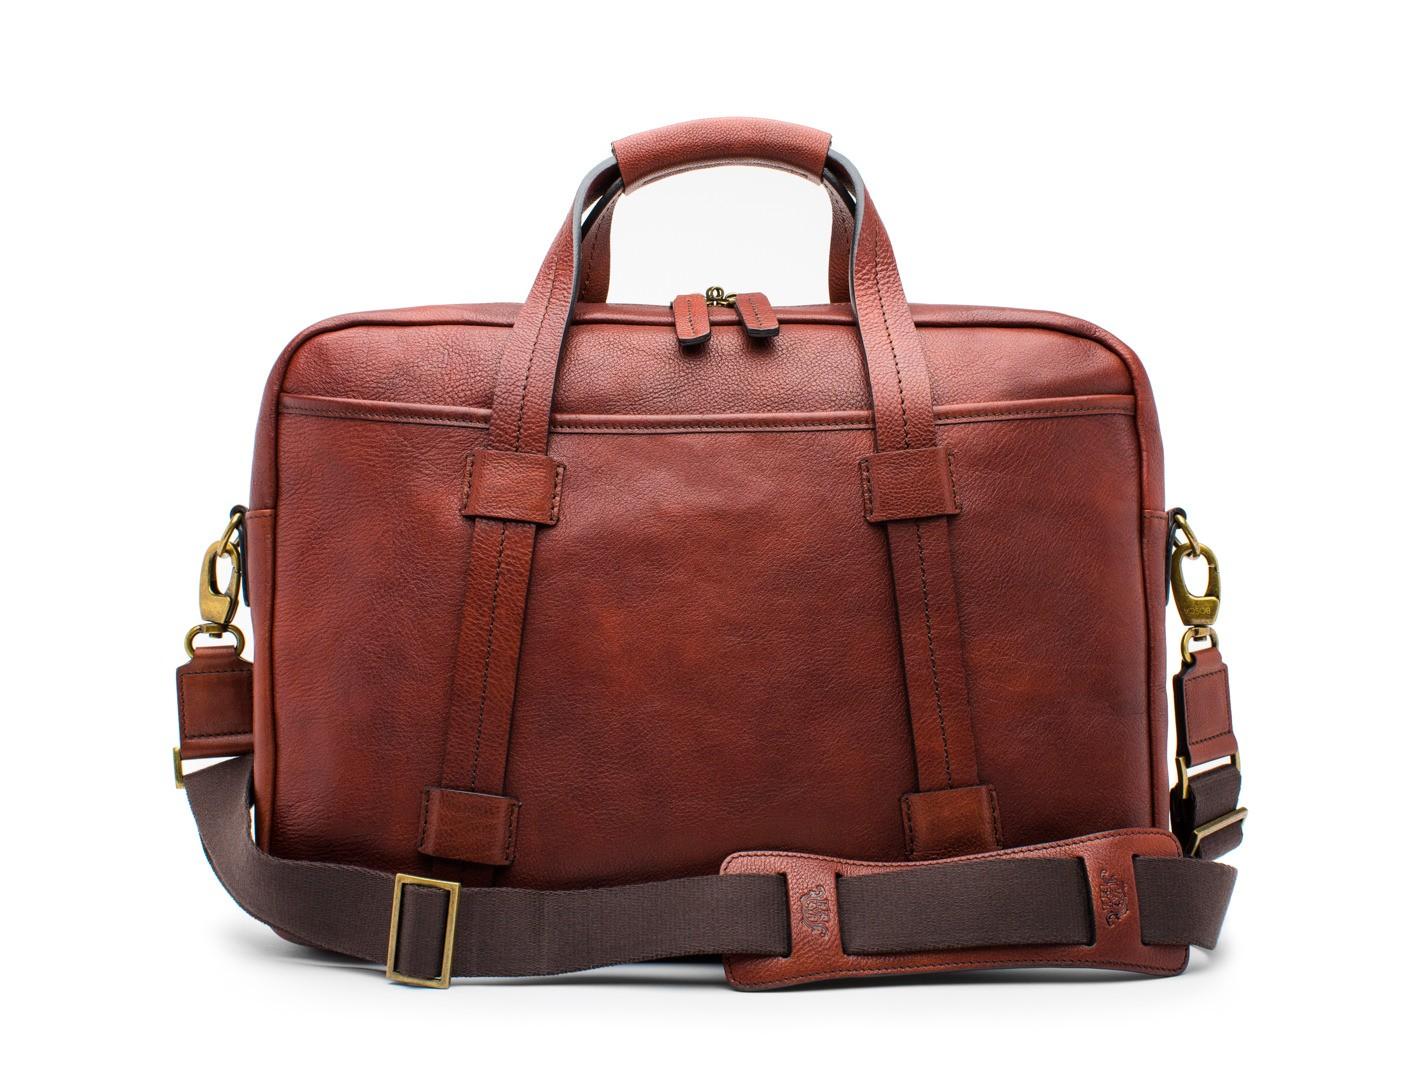 Washed Zip Top Bag